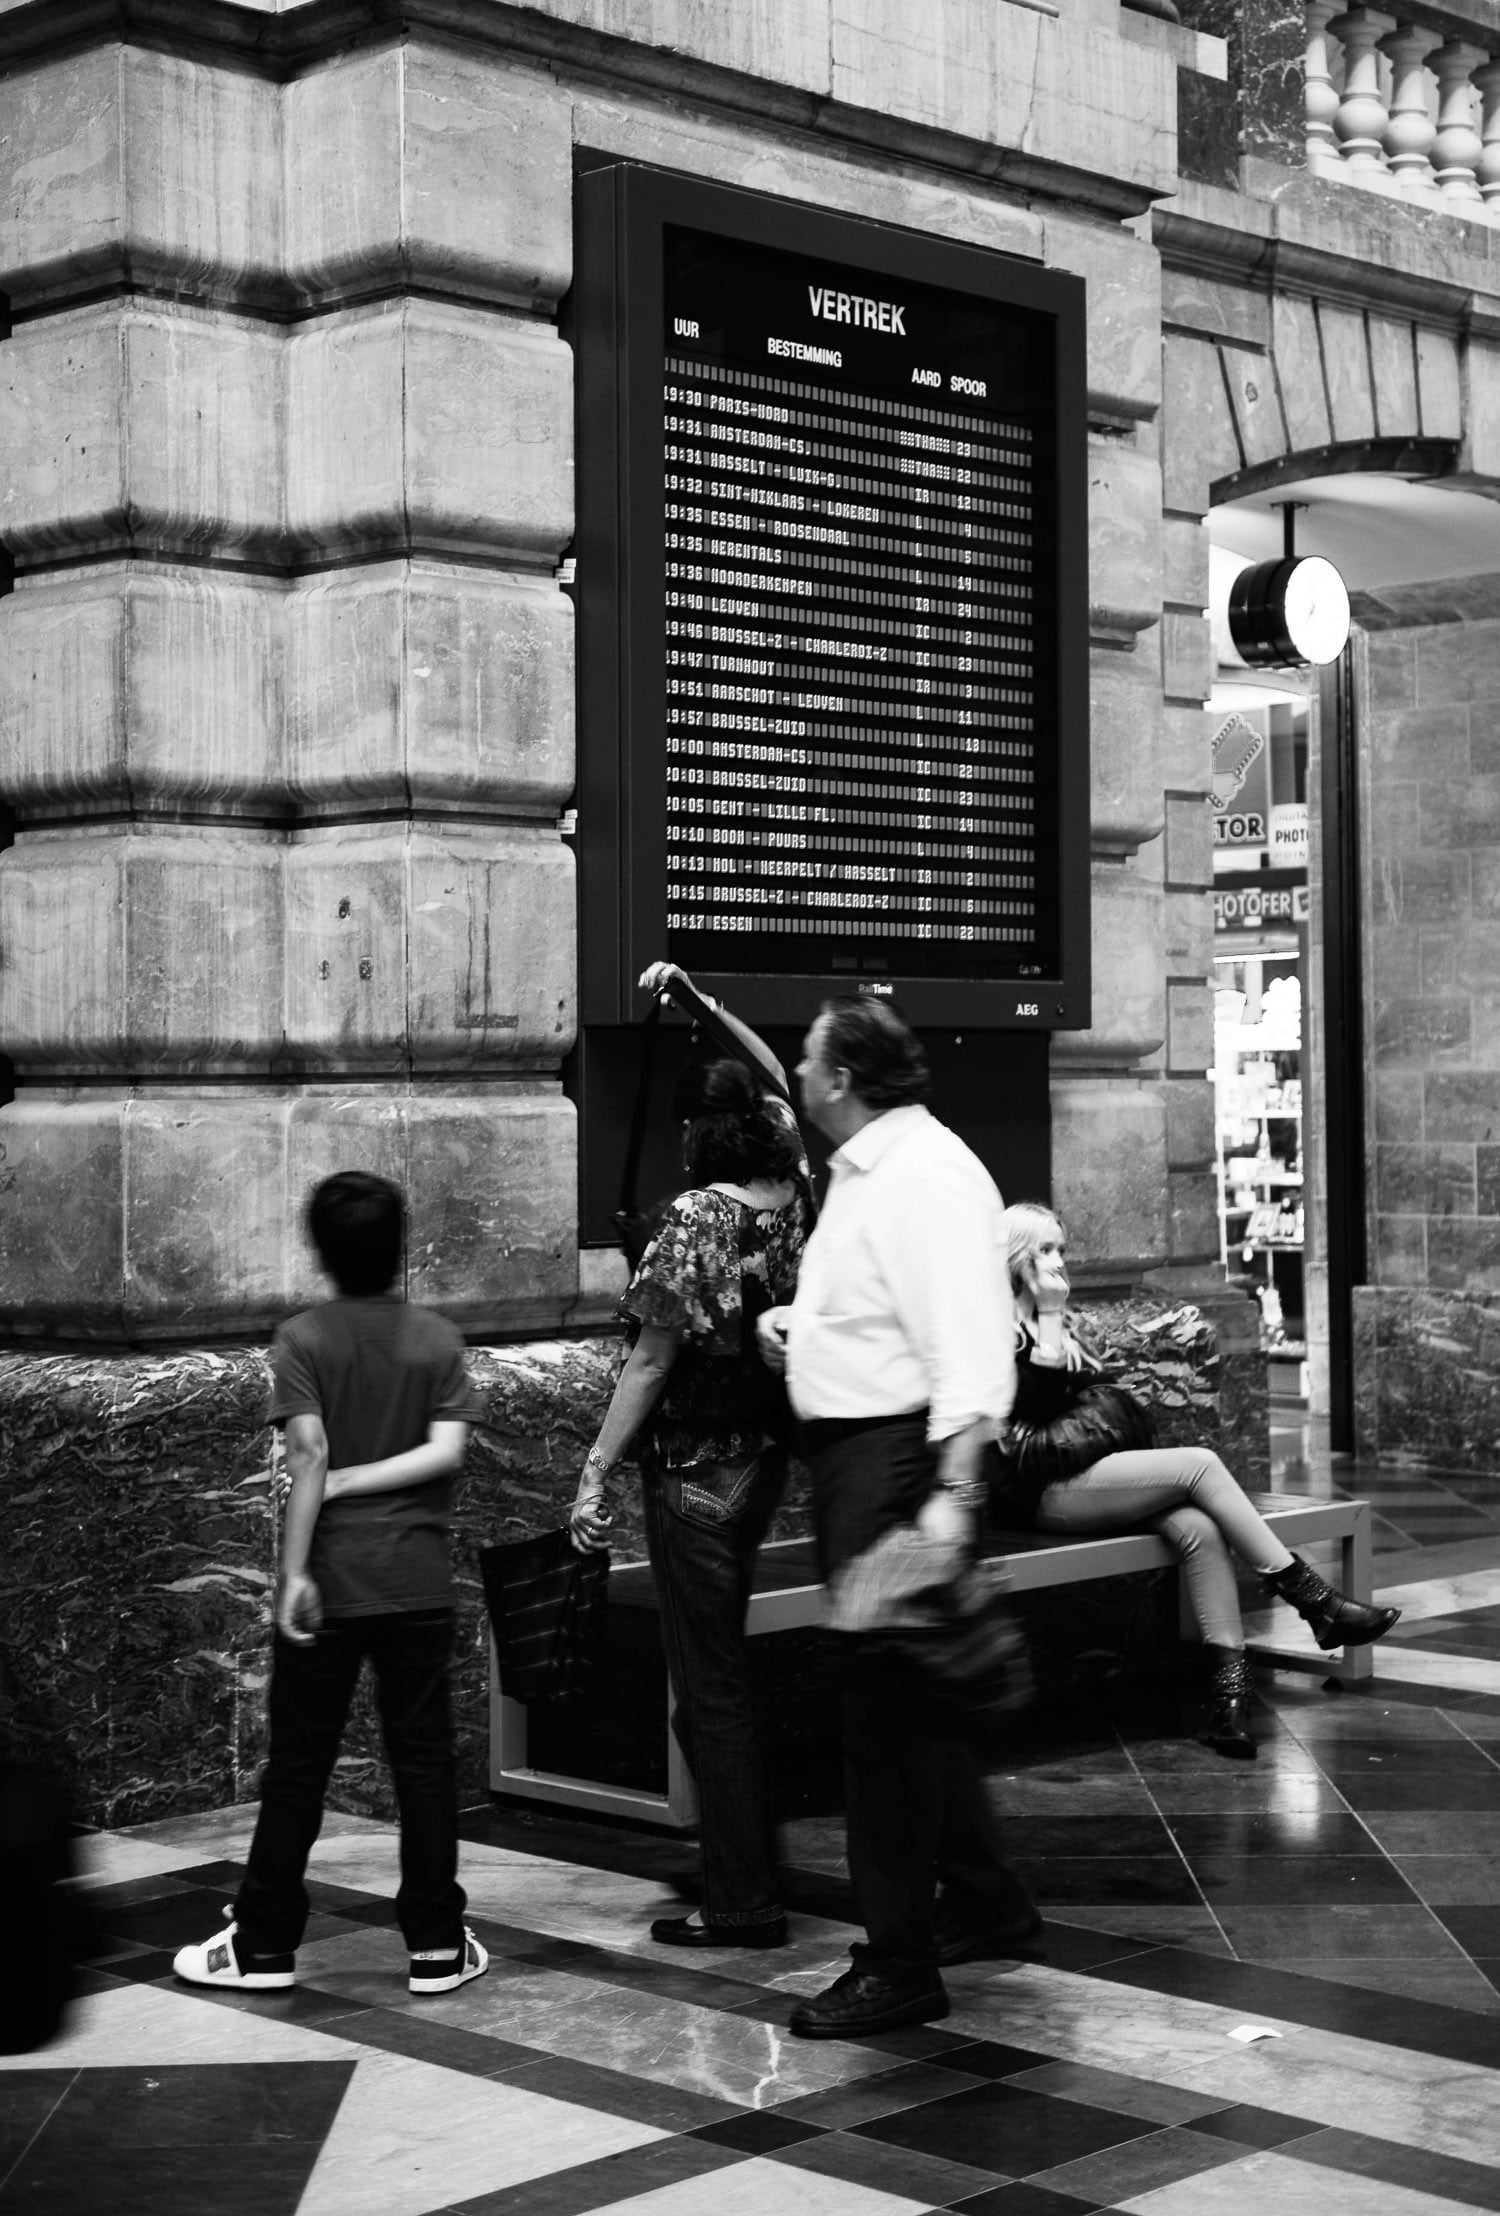 patricia-vanrespaille-photography-life-through-my-lens-008.jpg